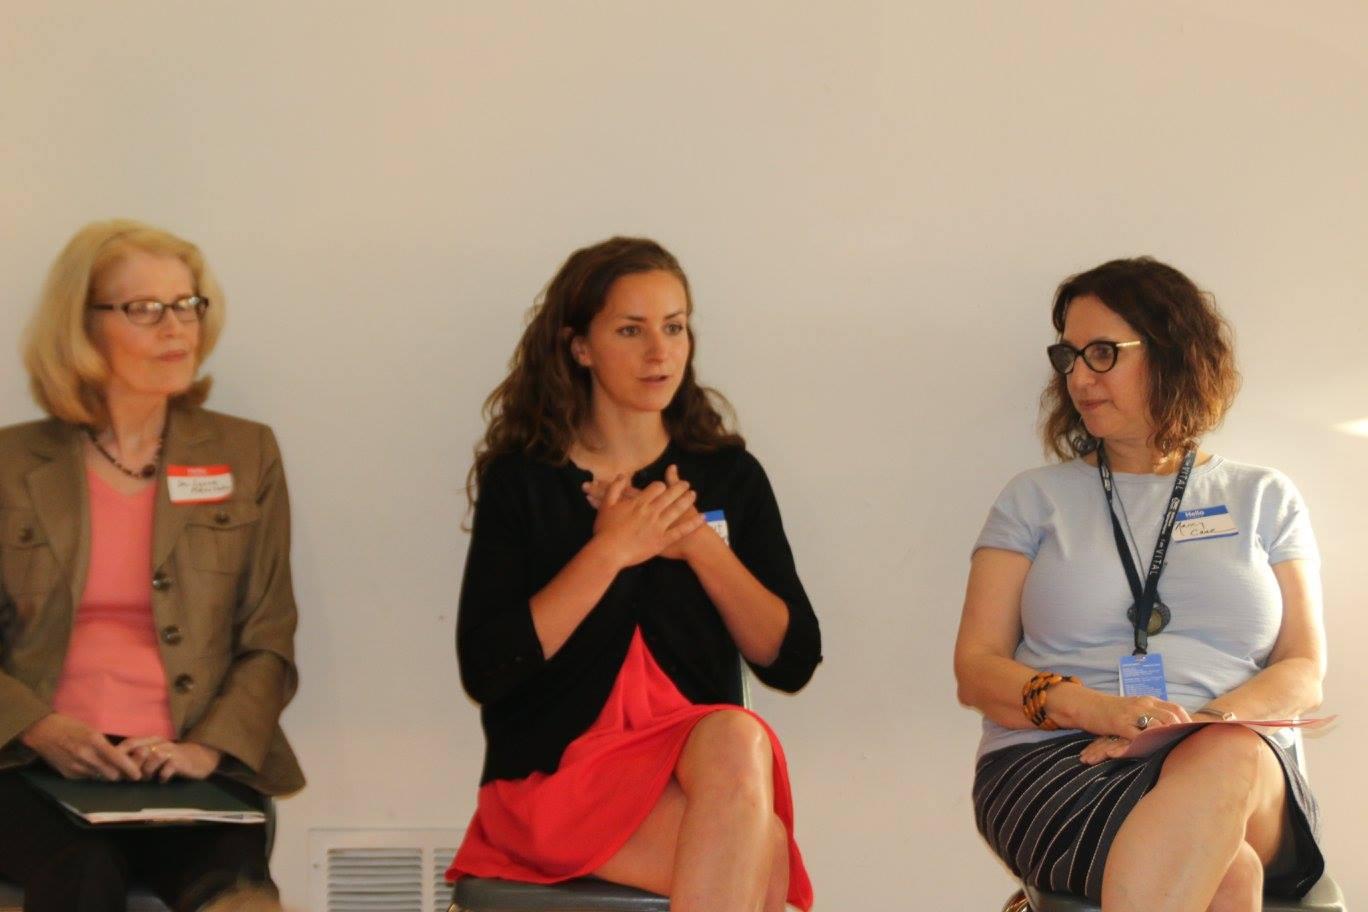 event panelists